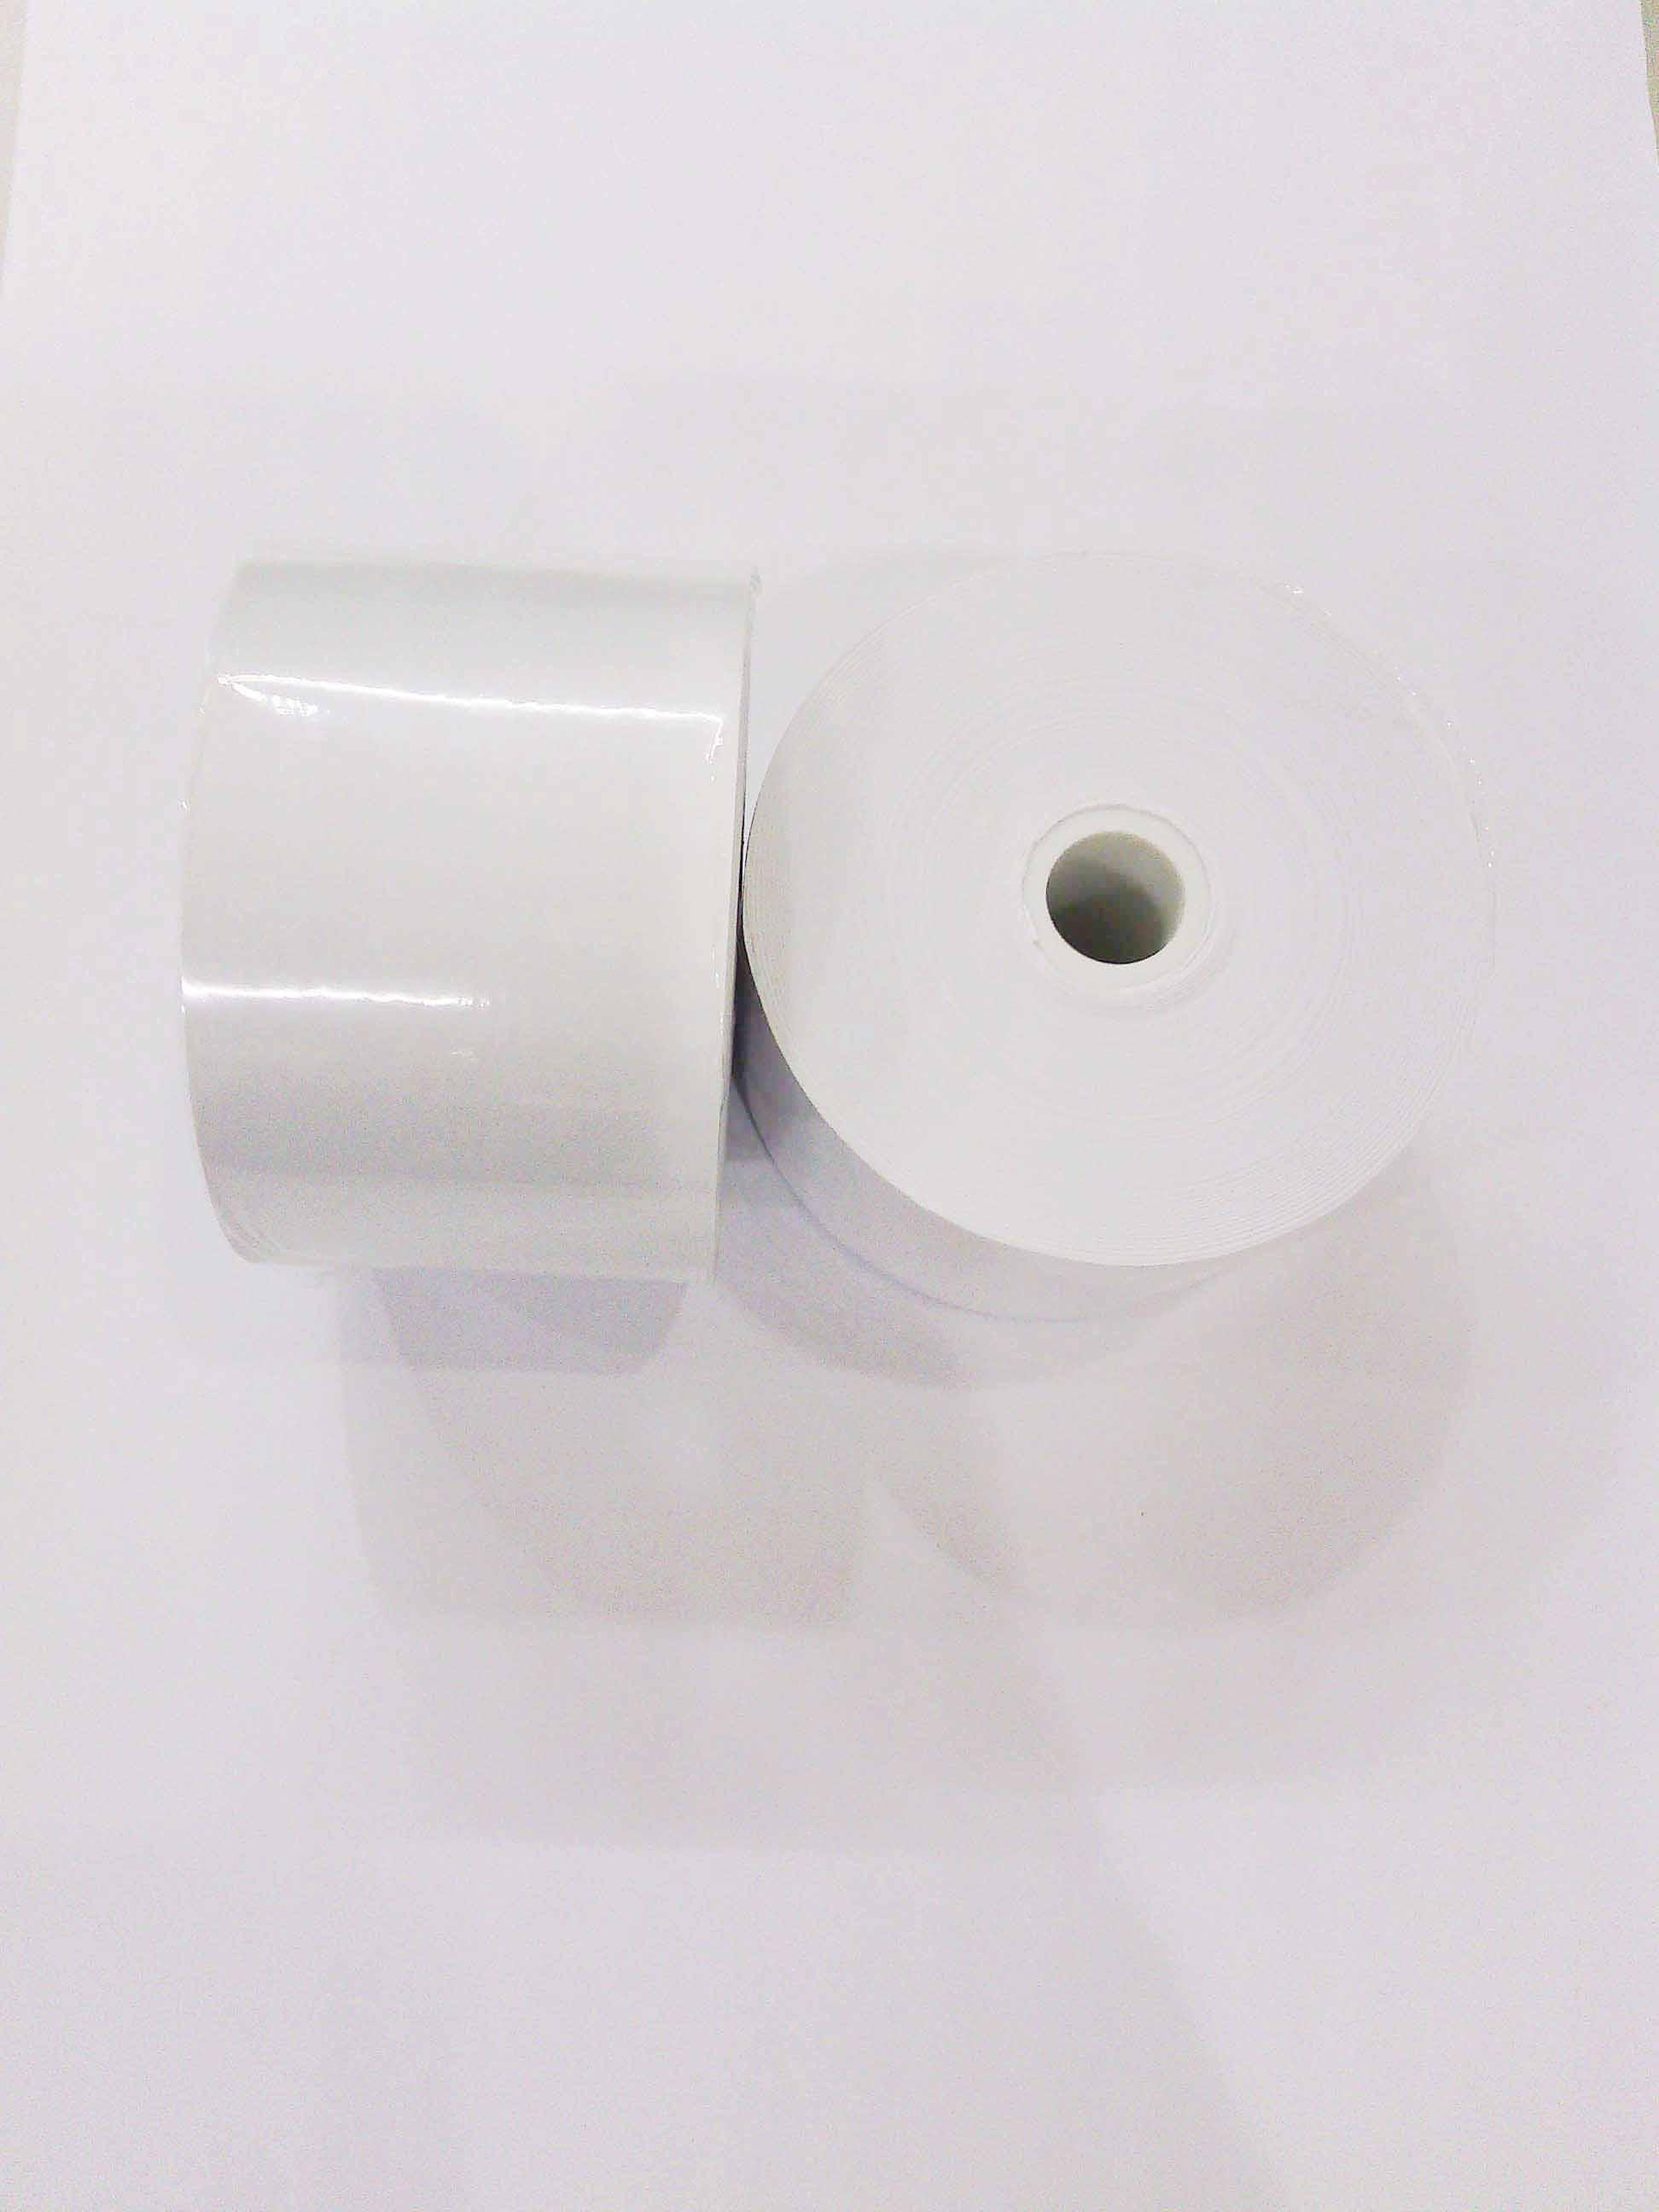 57*60*12mm (200卷)收銀收據機結帳空白紙捲 0